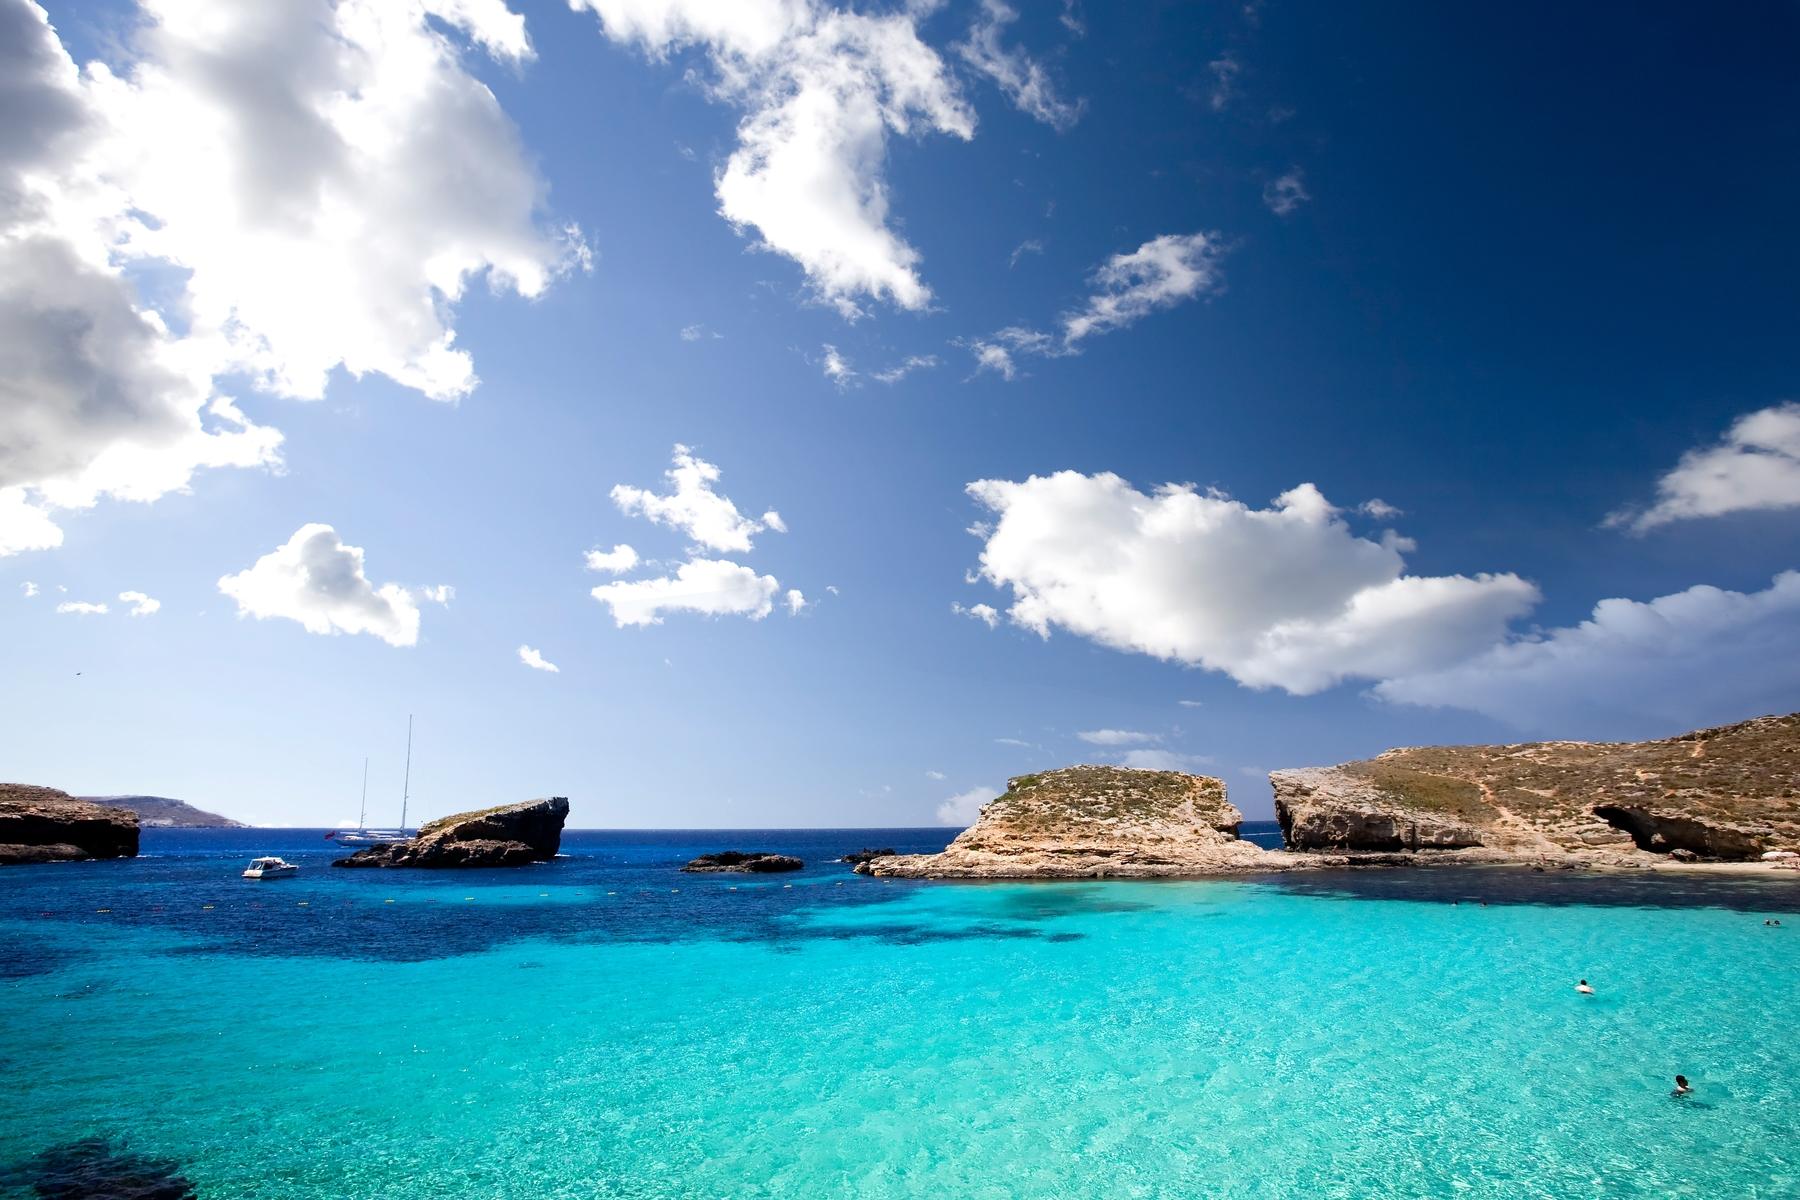 The clear ocean water in Malta